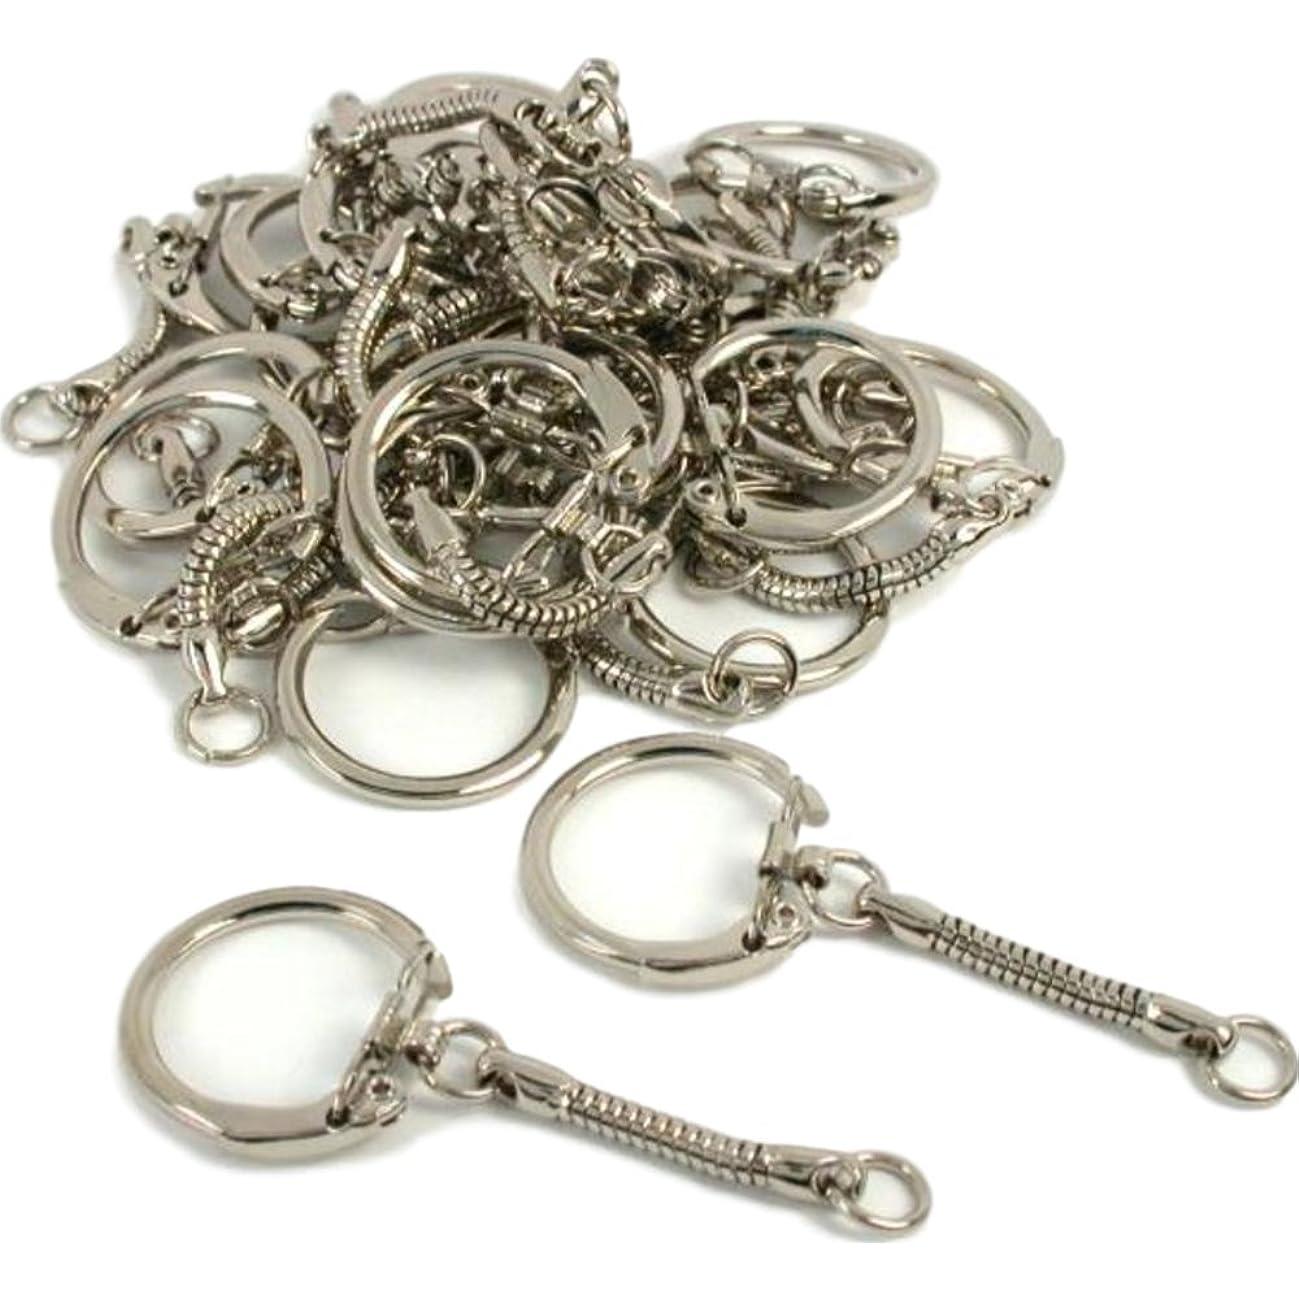 FindingKing Locking Key Chain 24Pcs